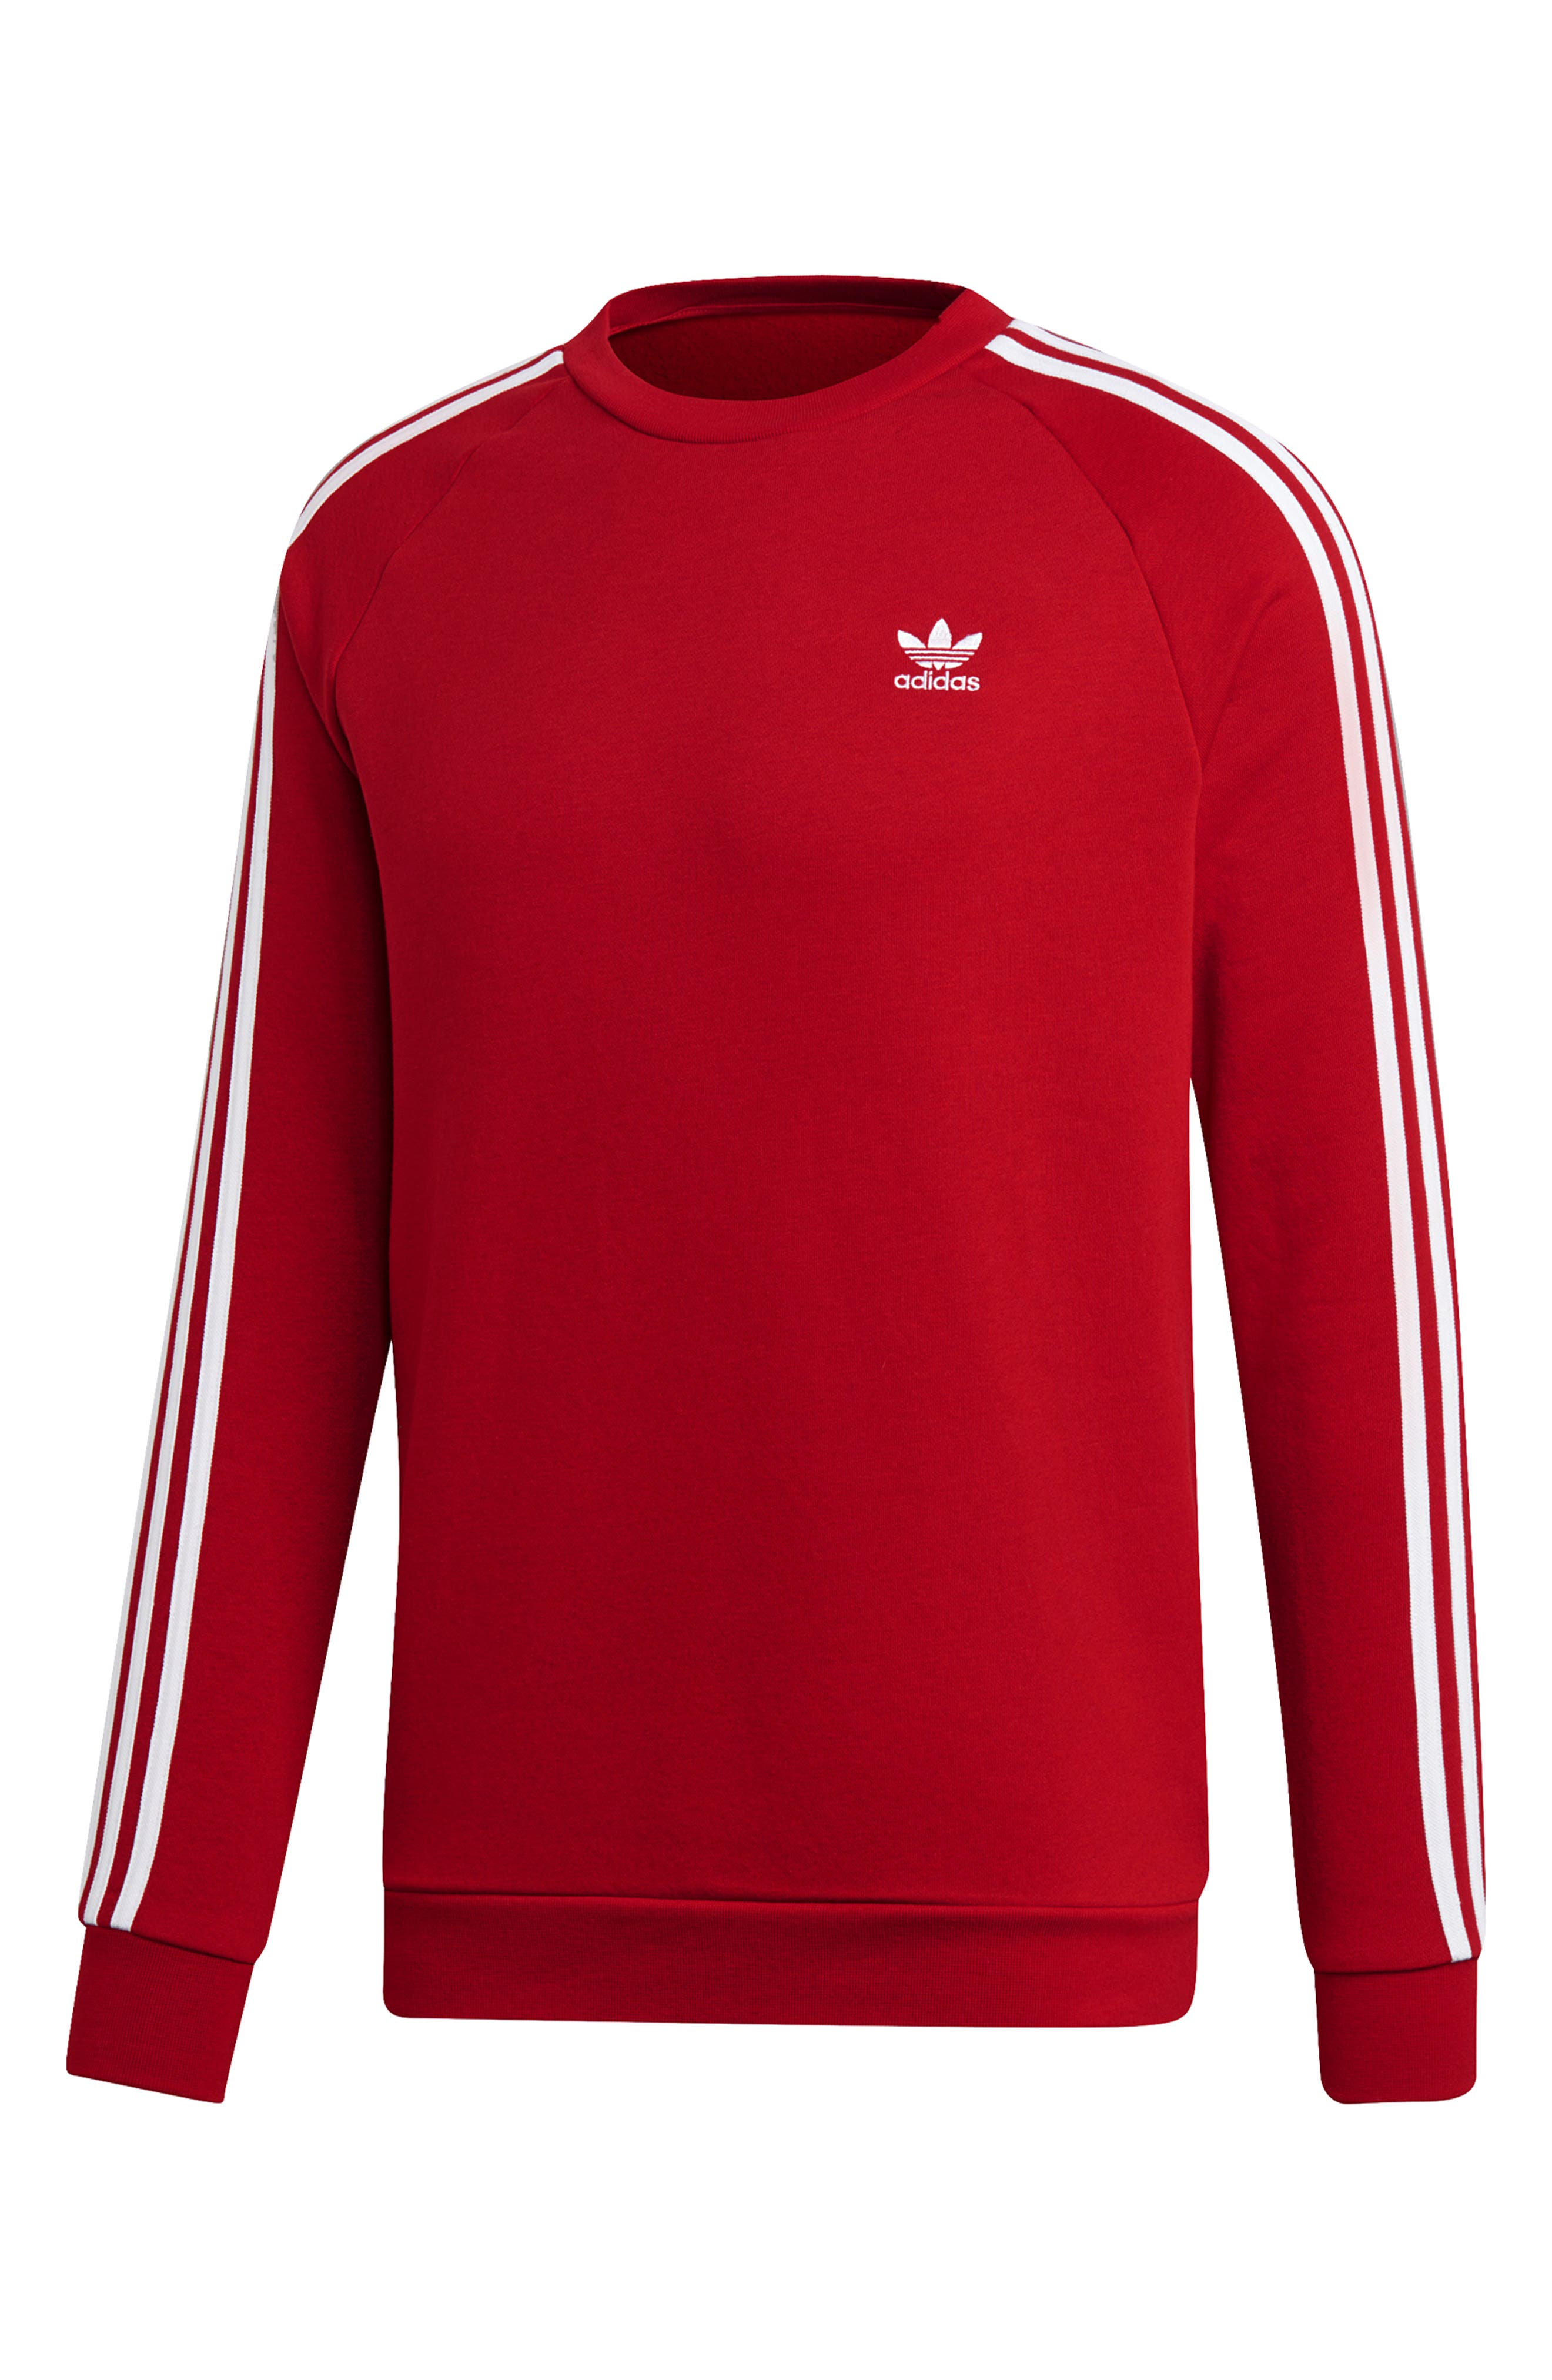 ADIDAS ORIGINALS, 3-Stripes Raglan Sweatshirt, Alternate thumbnail 5, color, POWER RED